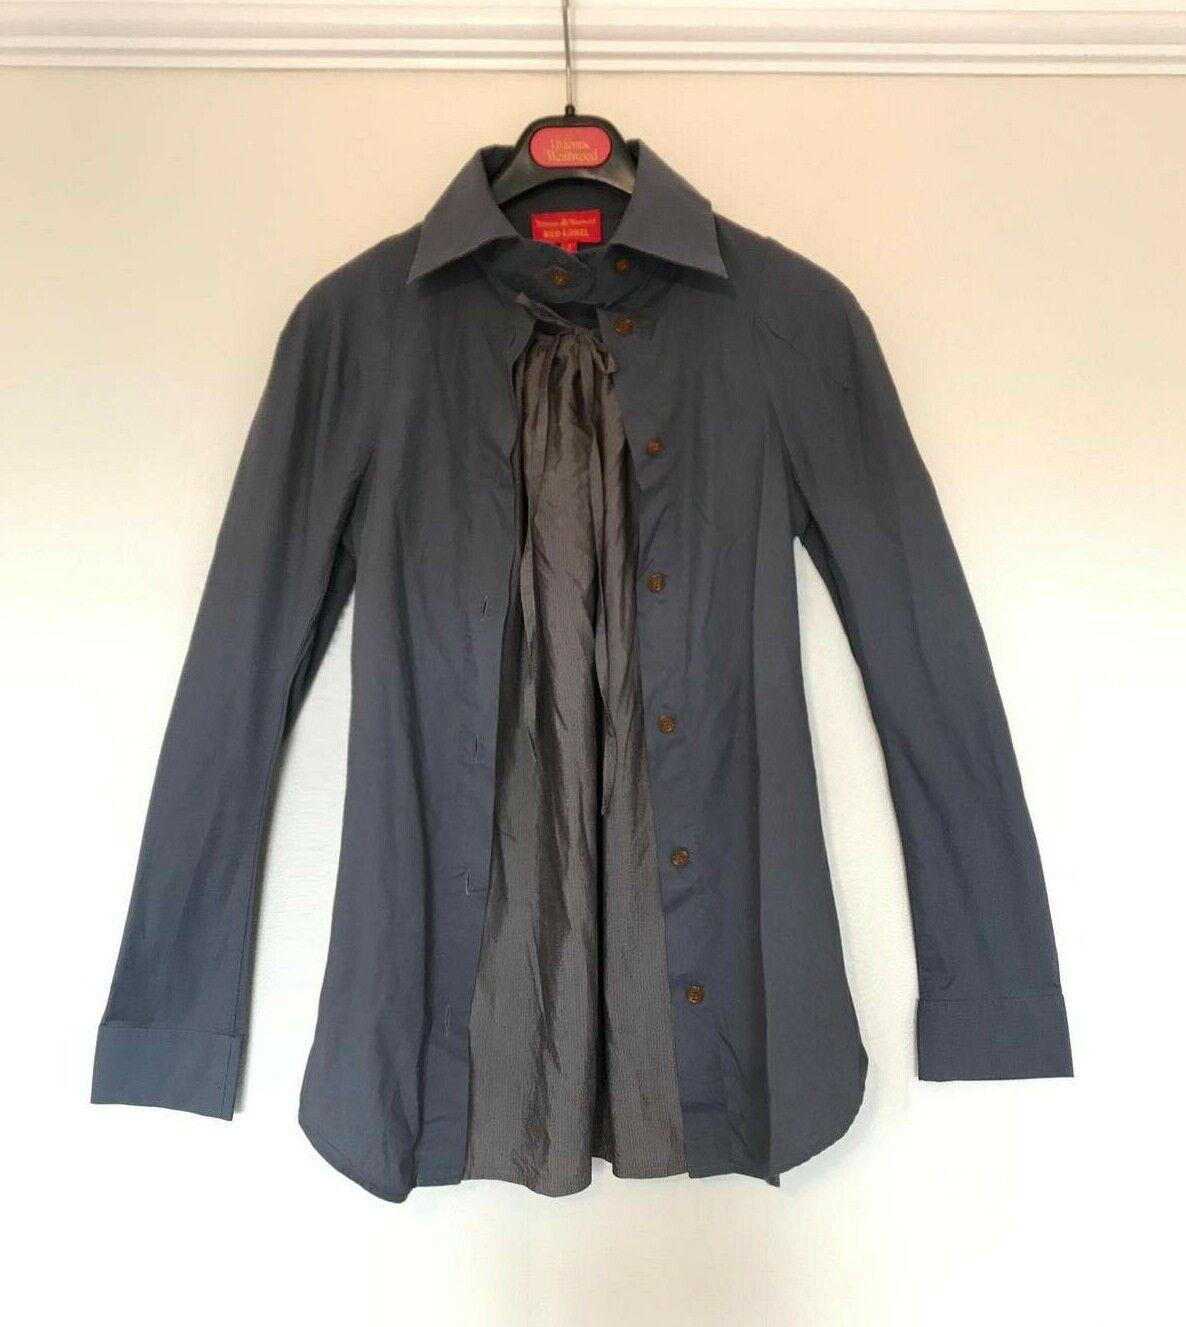 Vivienne Westwood rot Label navy Blau high collar shirt+built-in grau vest 10 12